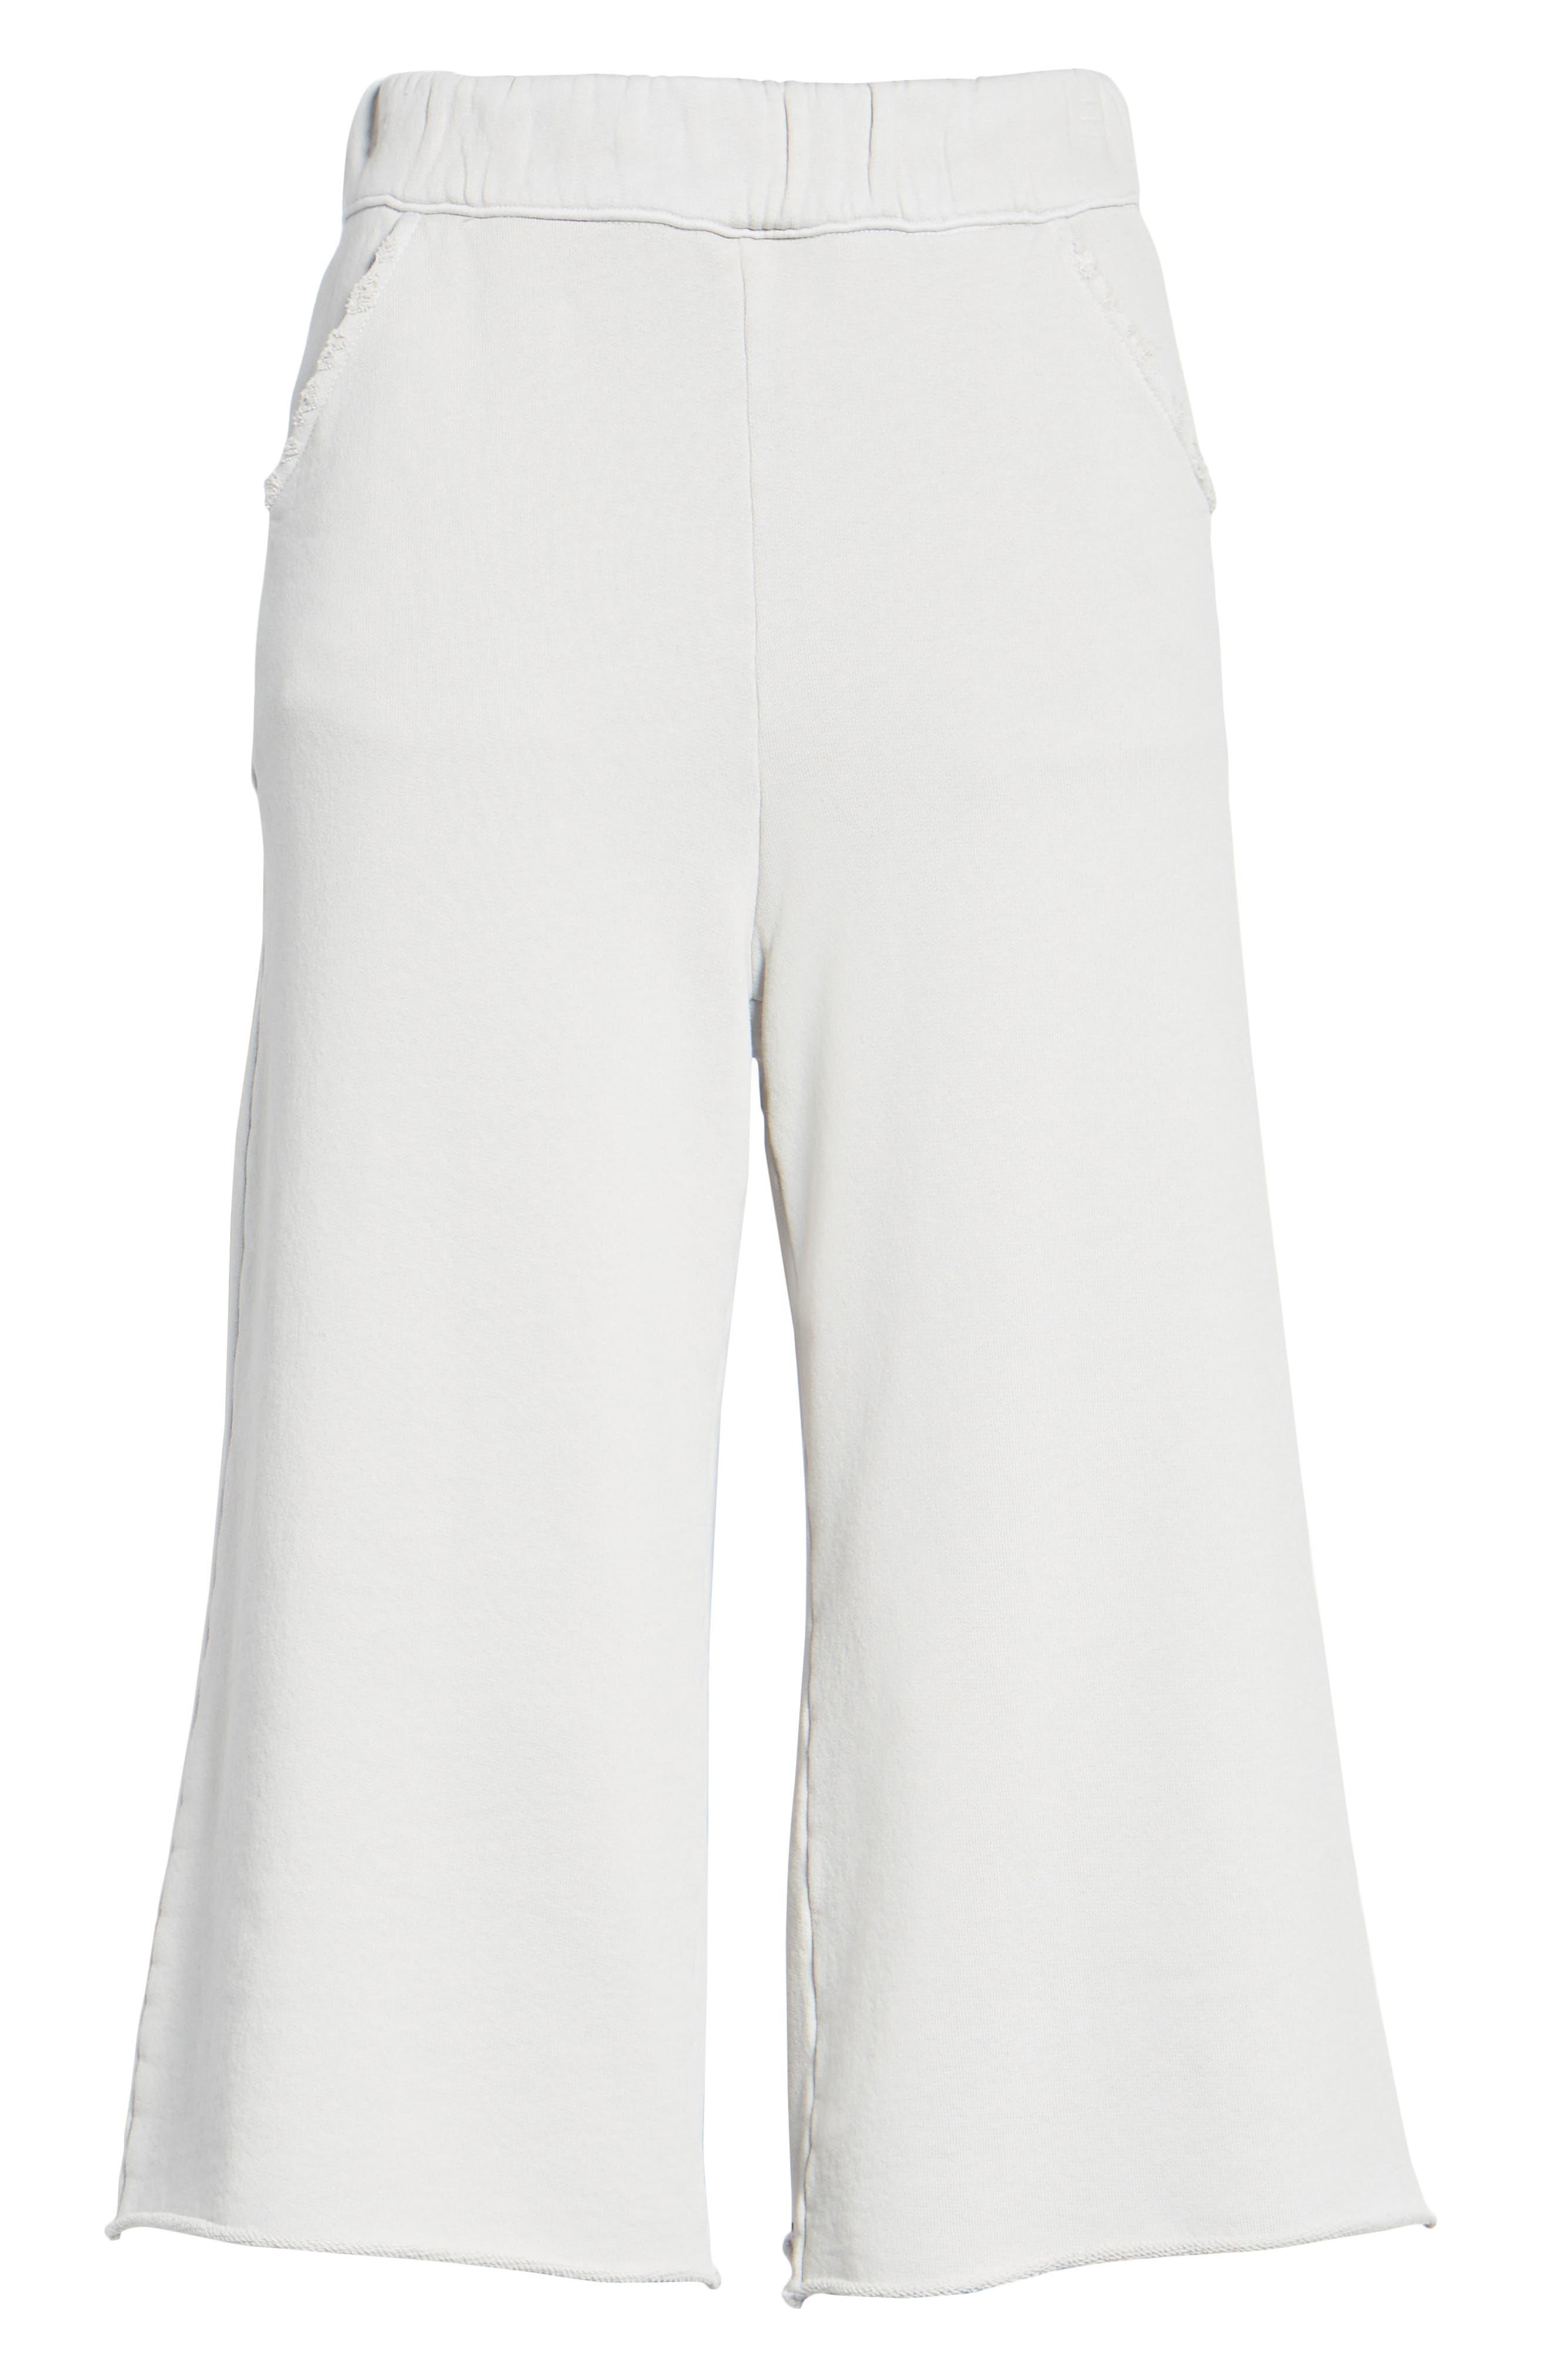 Fleece Knit Gauchos,                             Alternate thumbnail 6, color,                             038